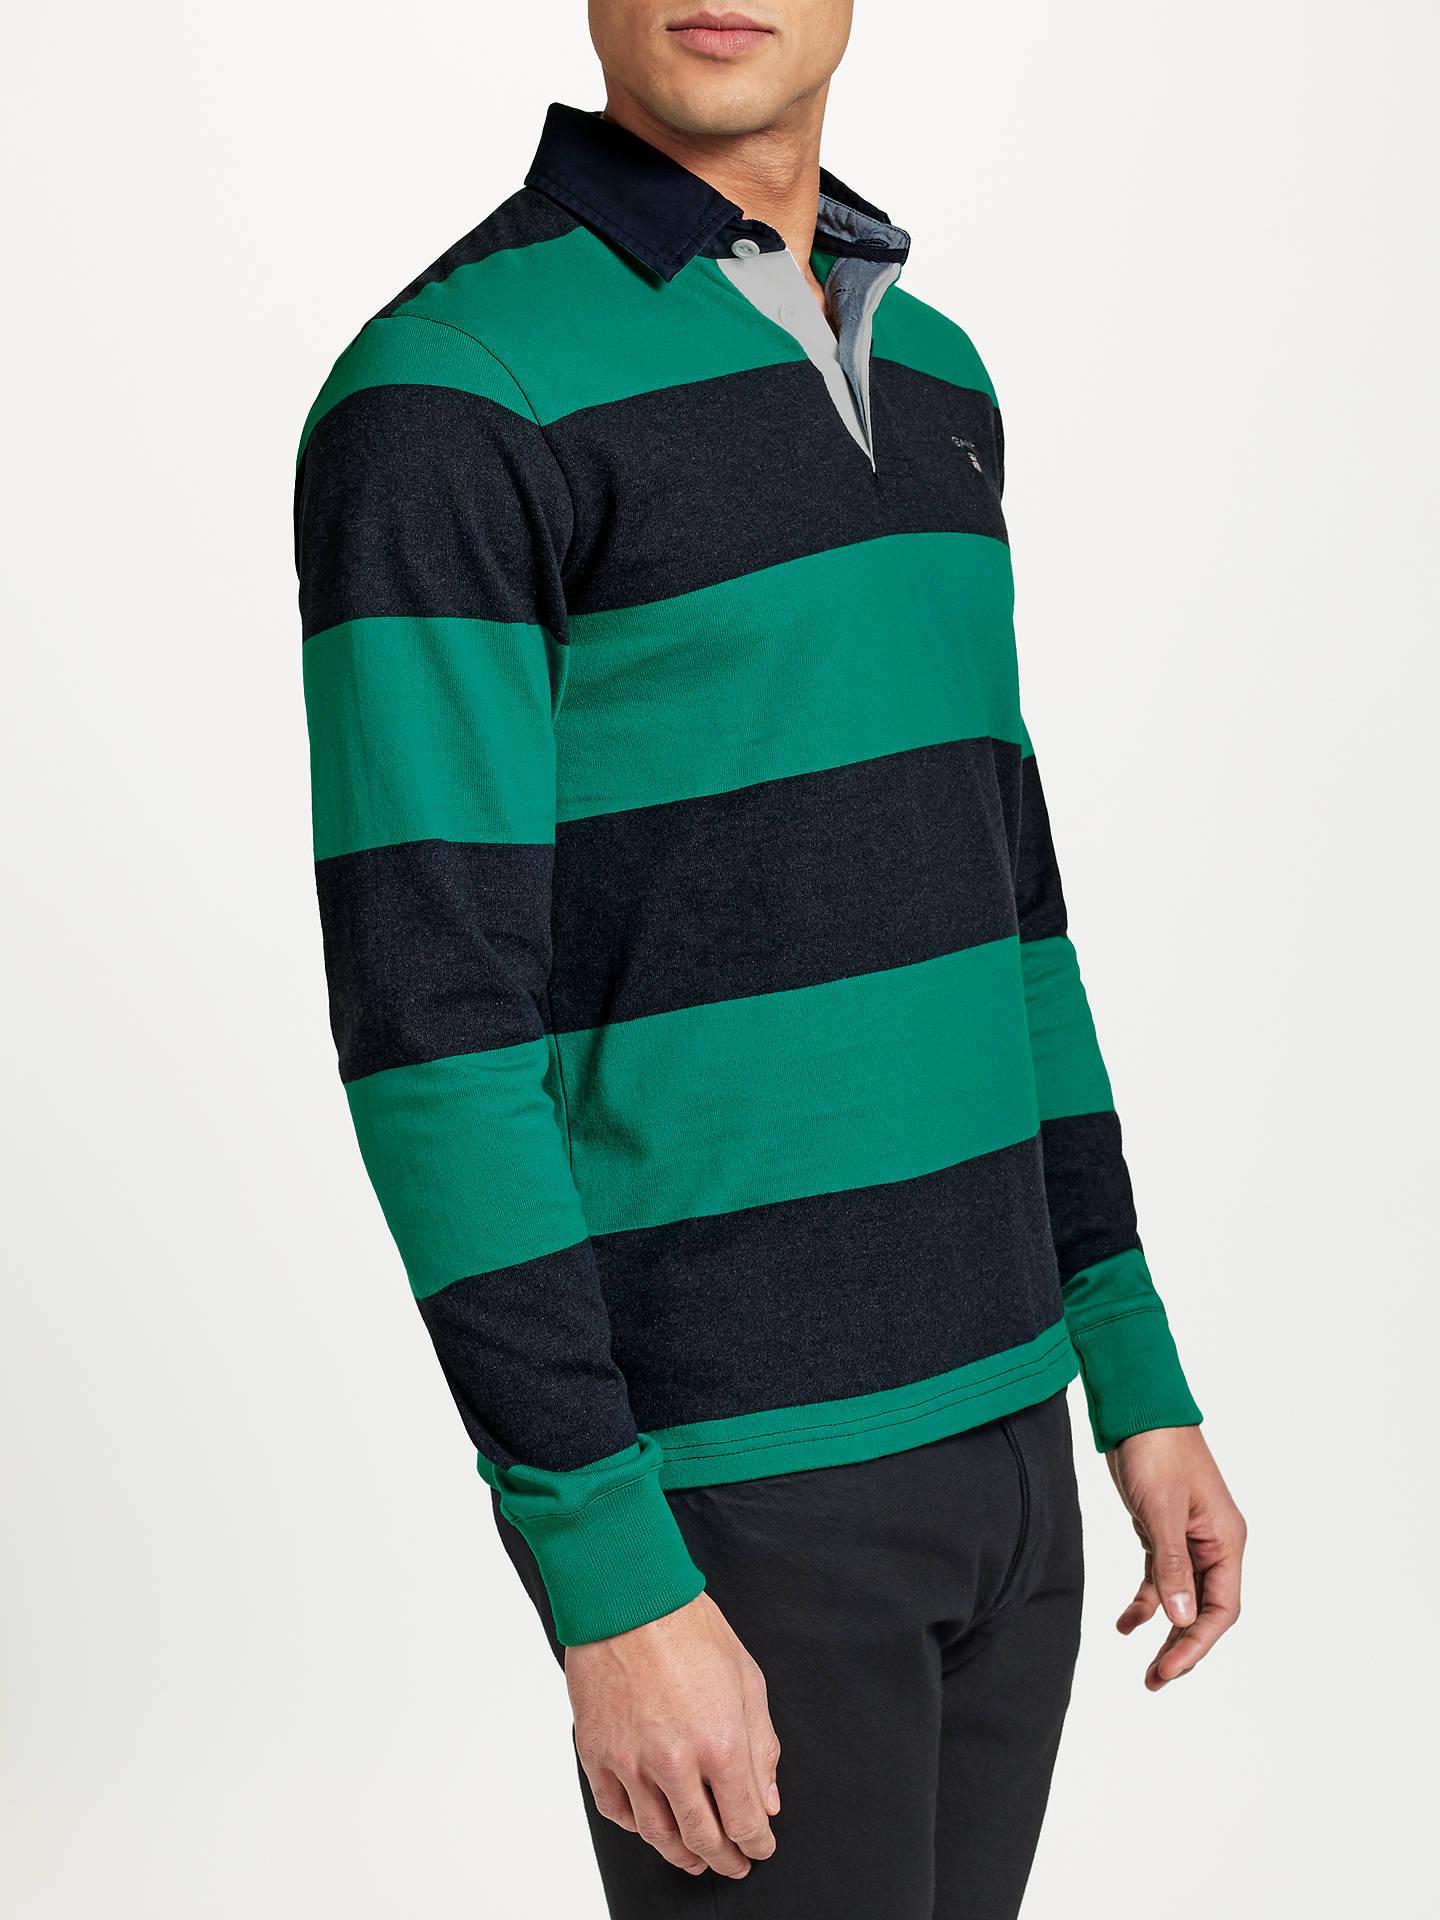 763fa10066 ... Buy GANT Rugger Bar Stripe Heavy Jersey Rugby Shirt, Emerald Green, M  Online at